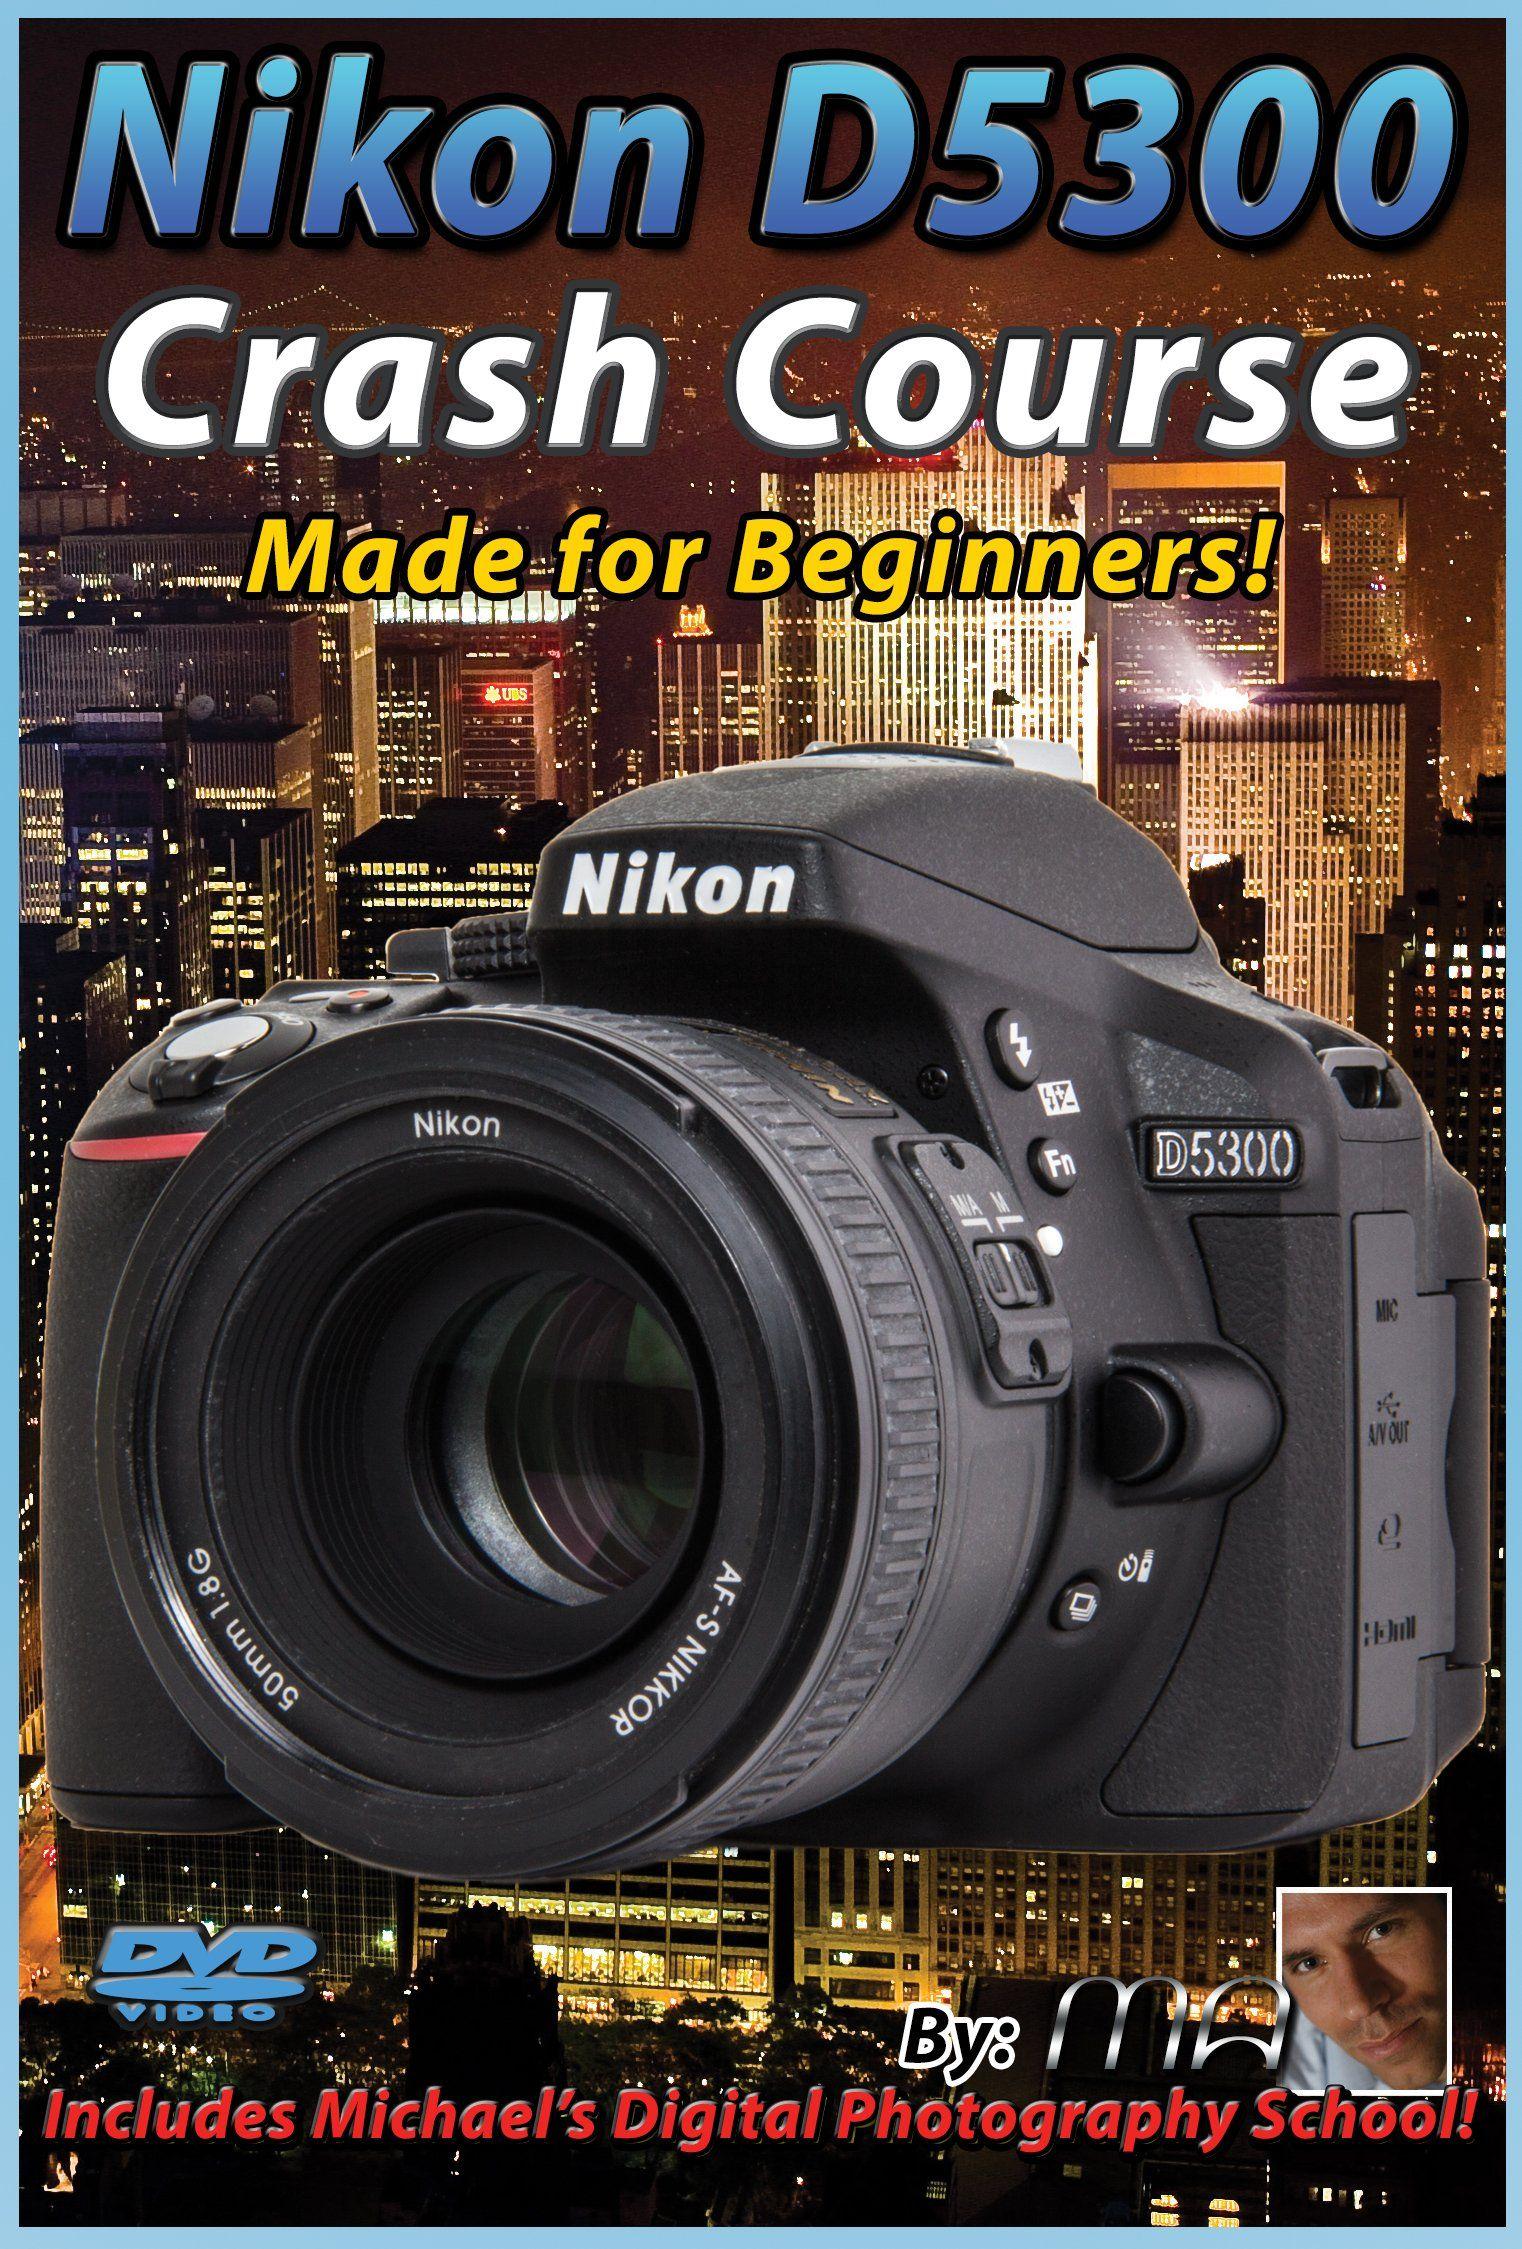 nikon d5300 crash course training tutorial dvd | made for beginners